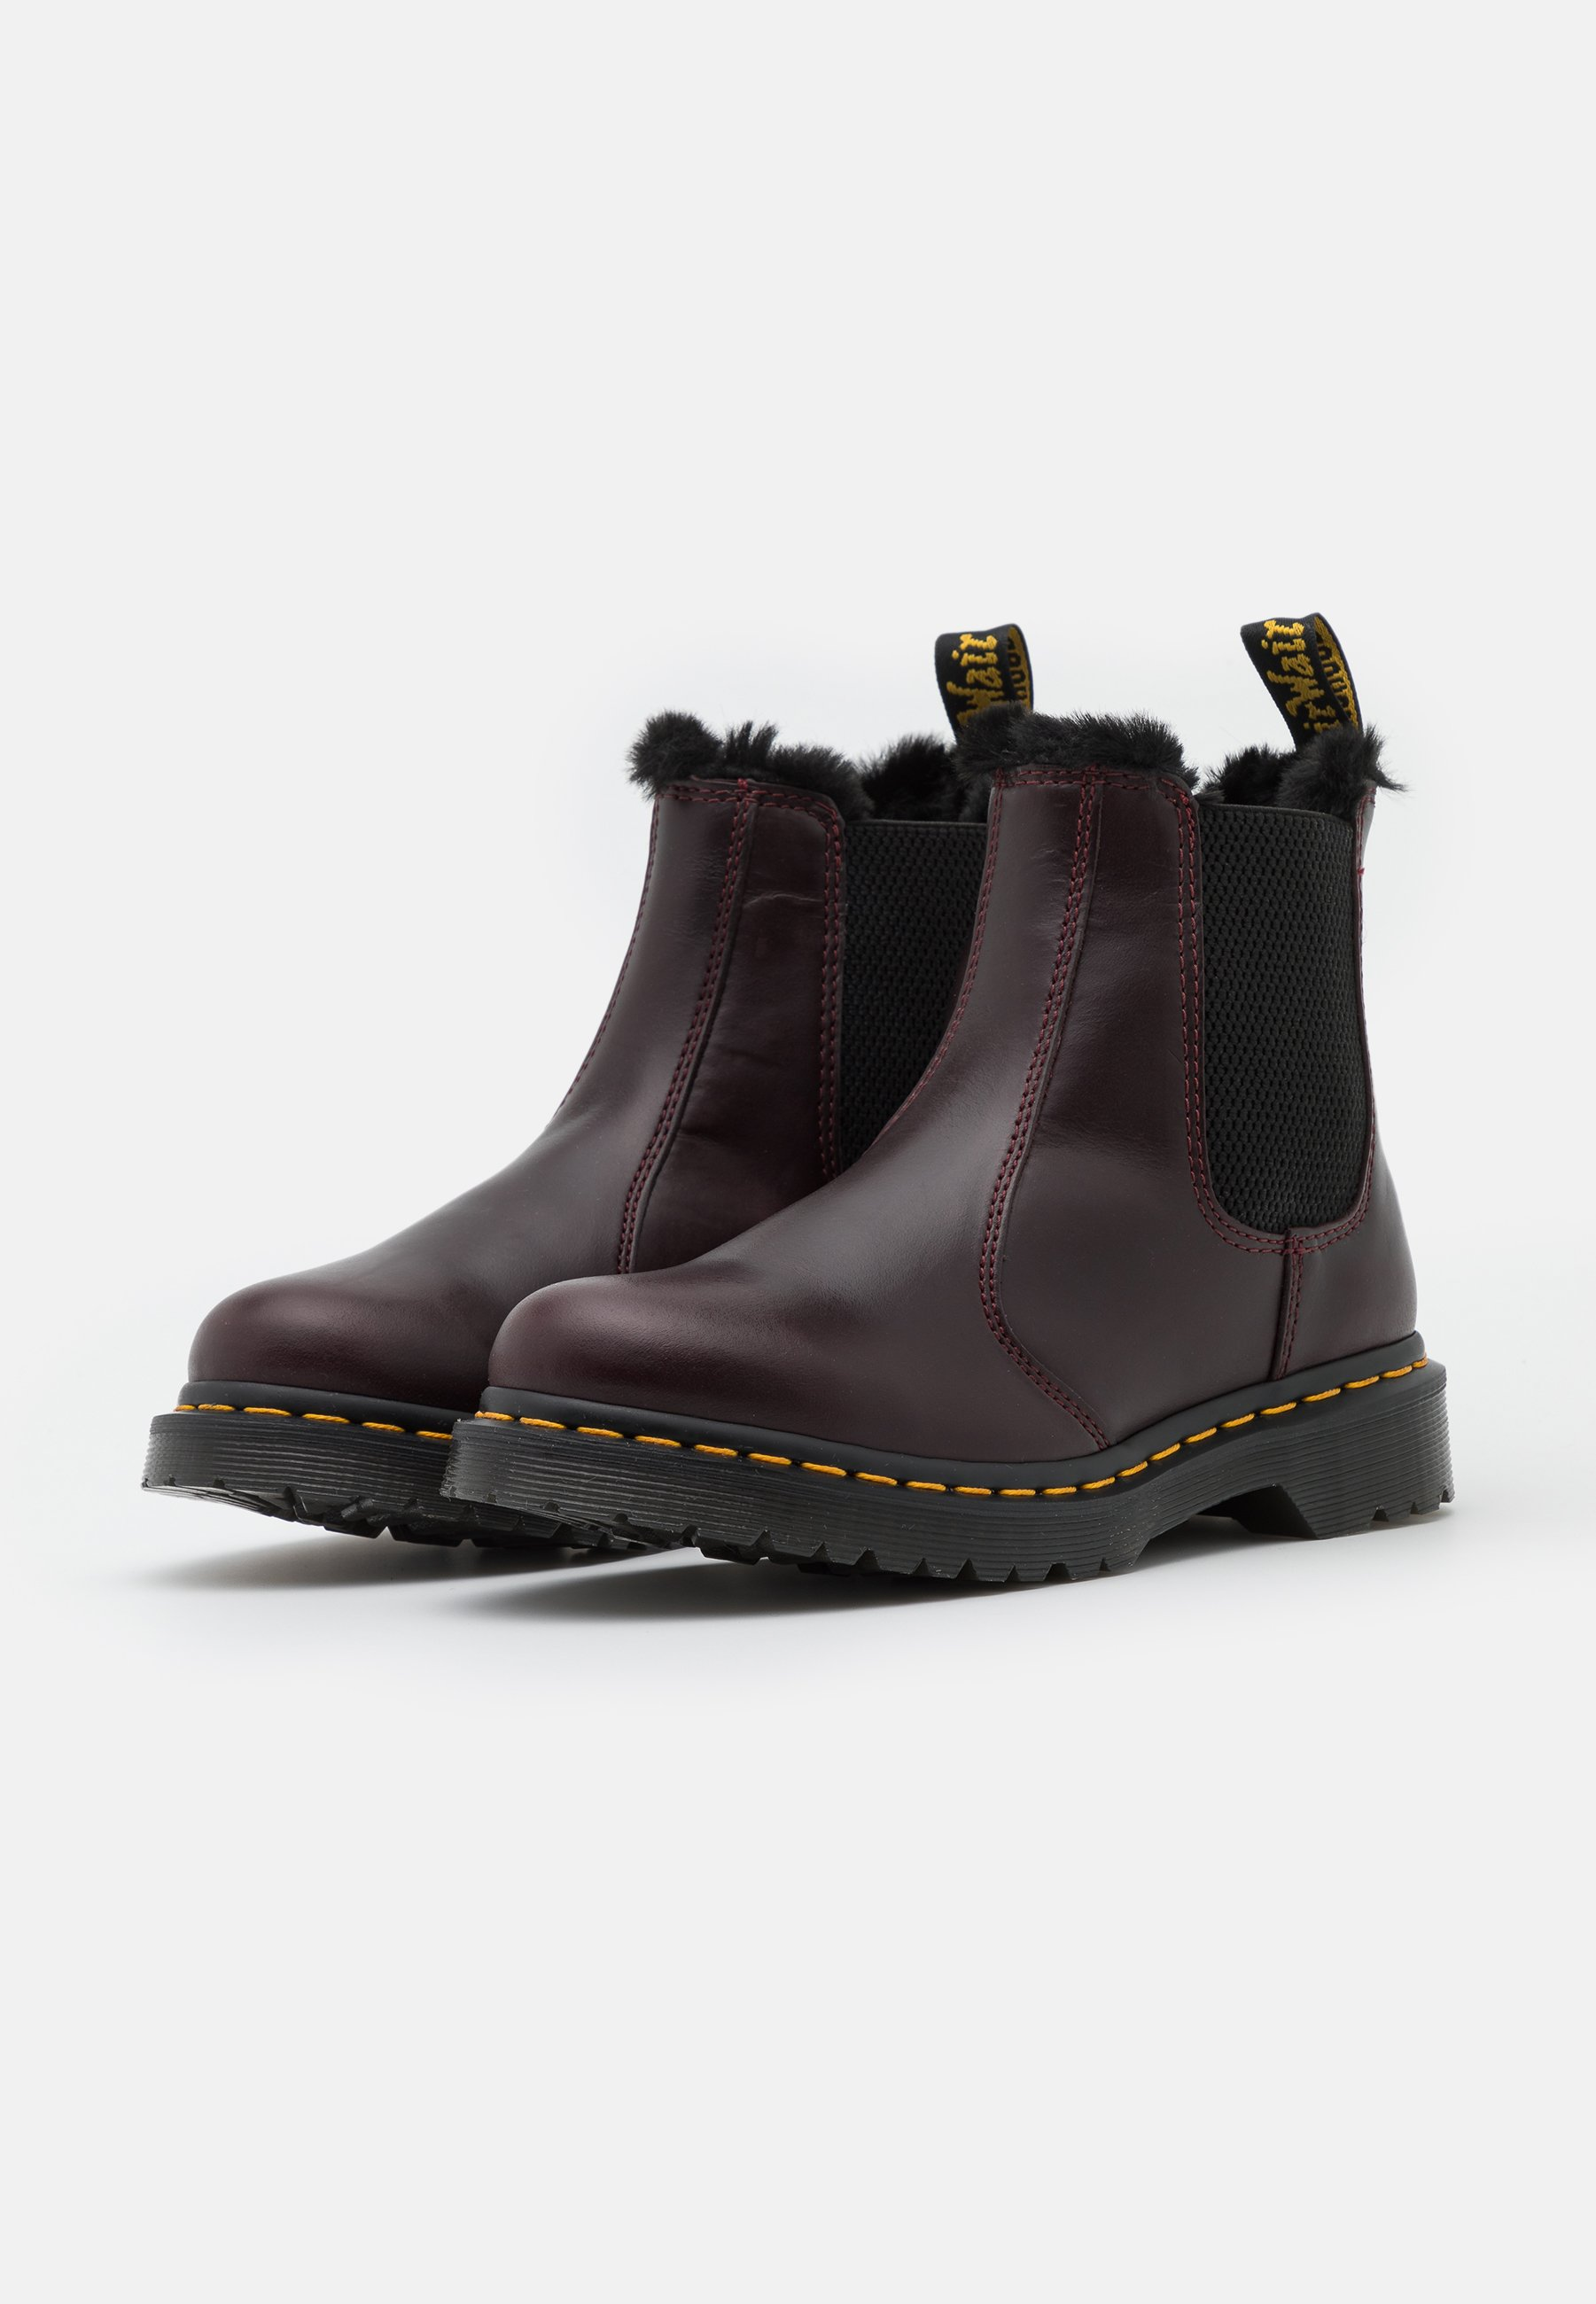 Dr. Martens 2976 LEONORE - Nilkkurit - oxblood - Naisten kengät cp6hA